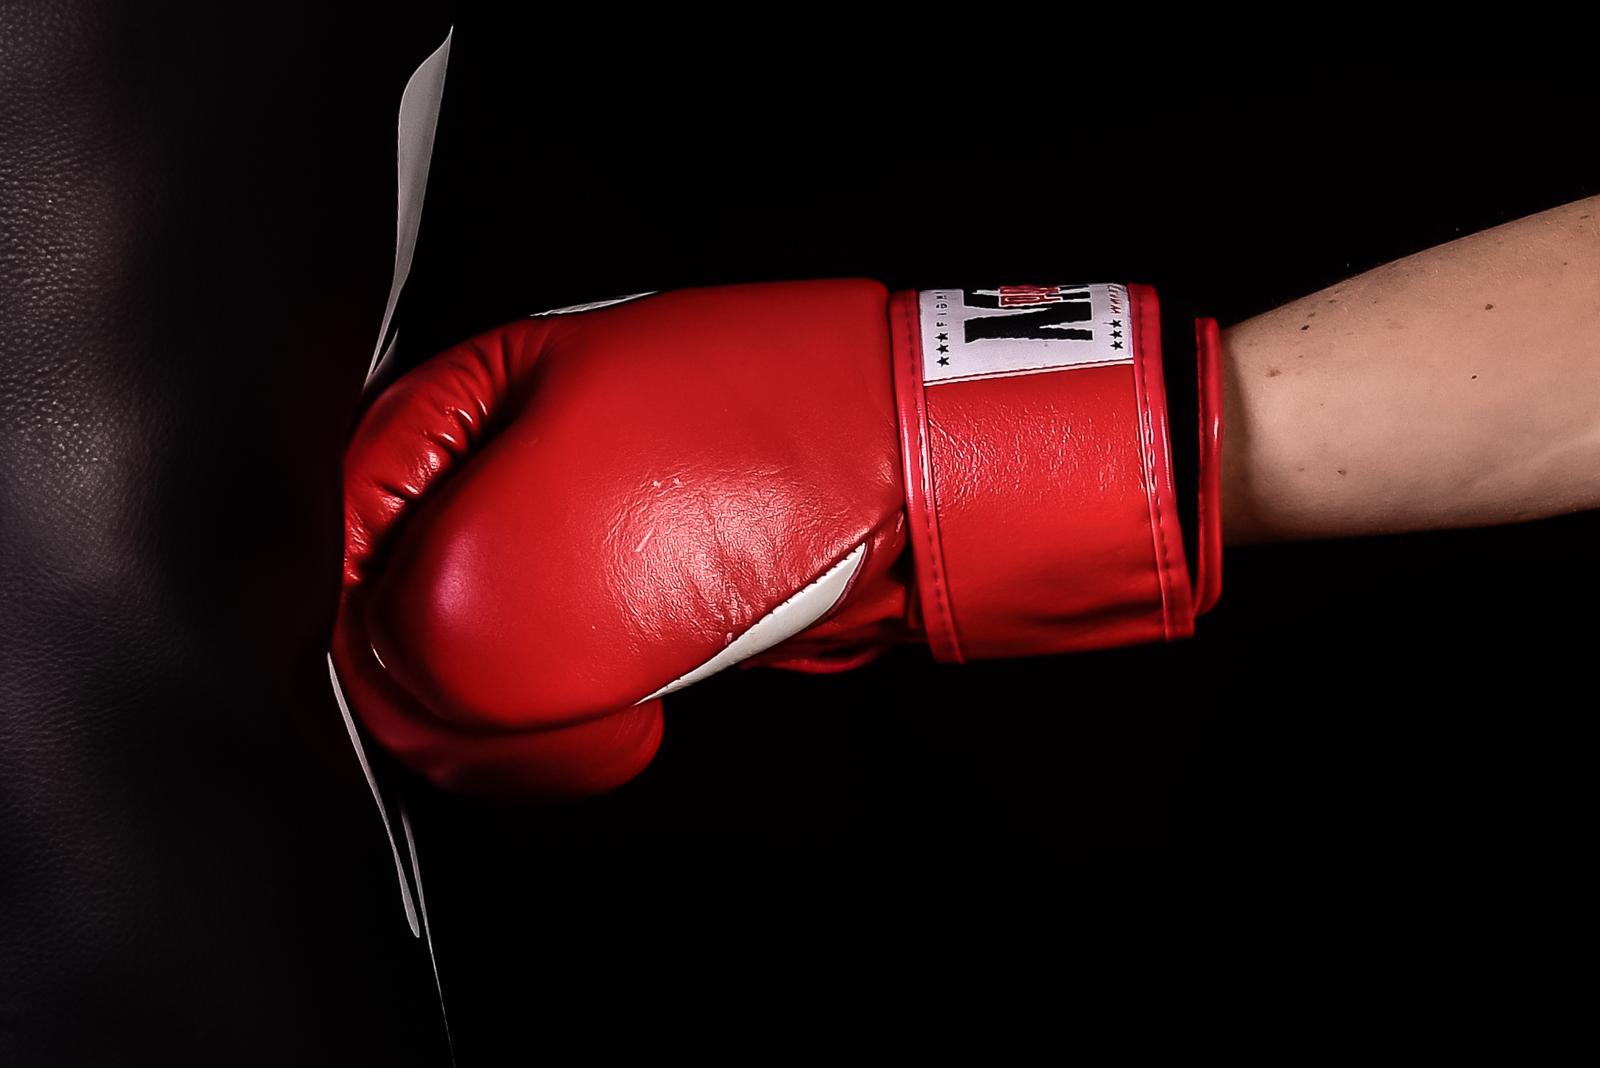 Boxing glove striking a bag - photo by David Ellard